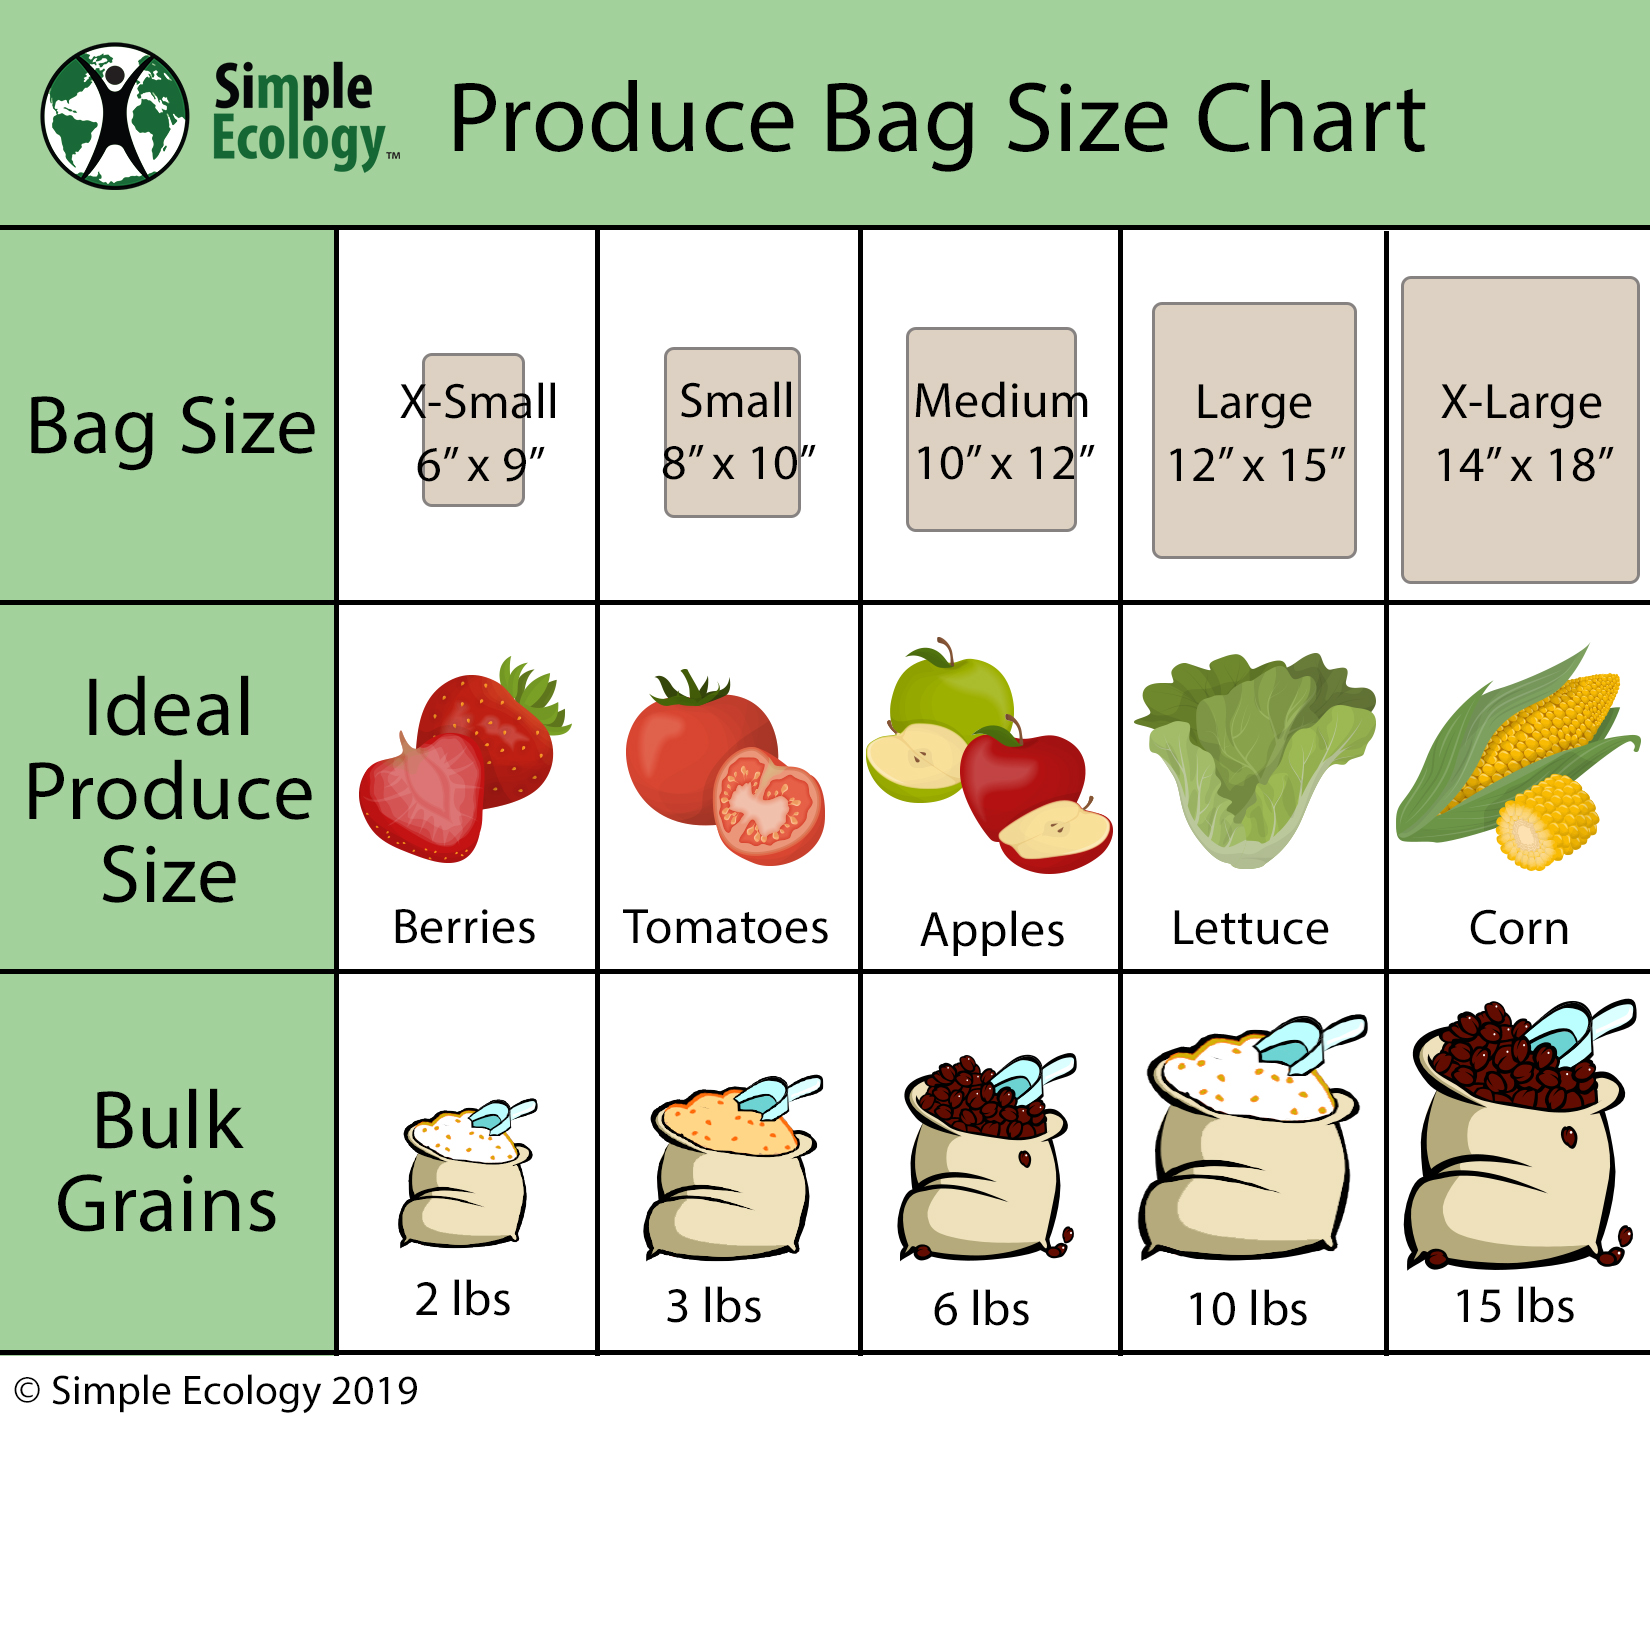 Produce Bag Size Chart.jpg